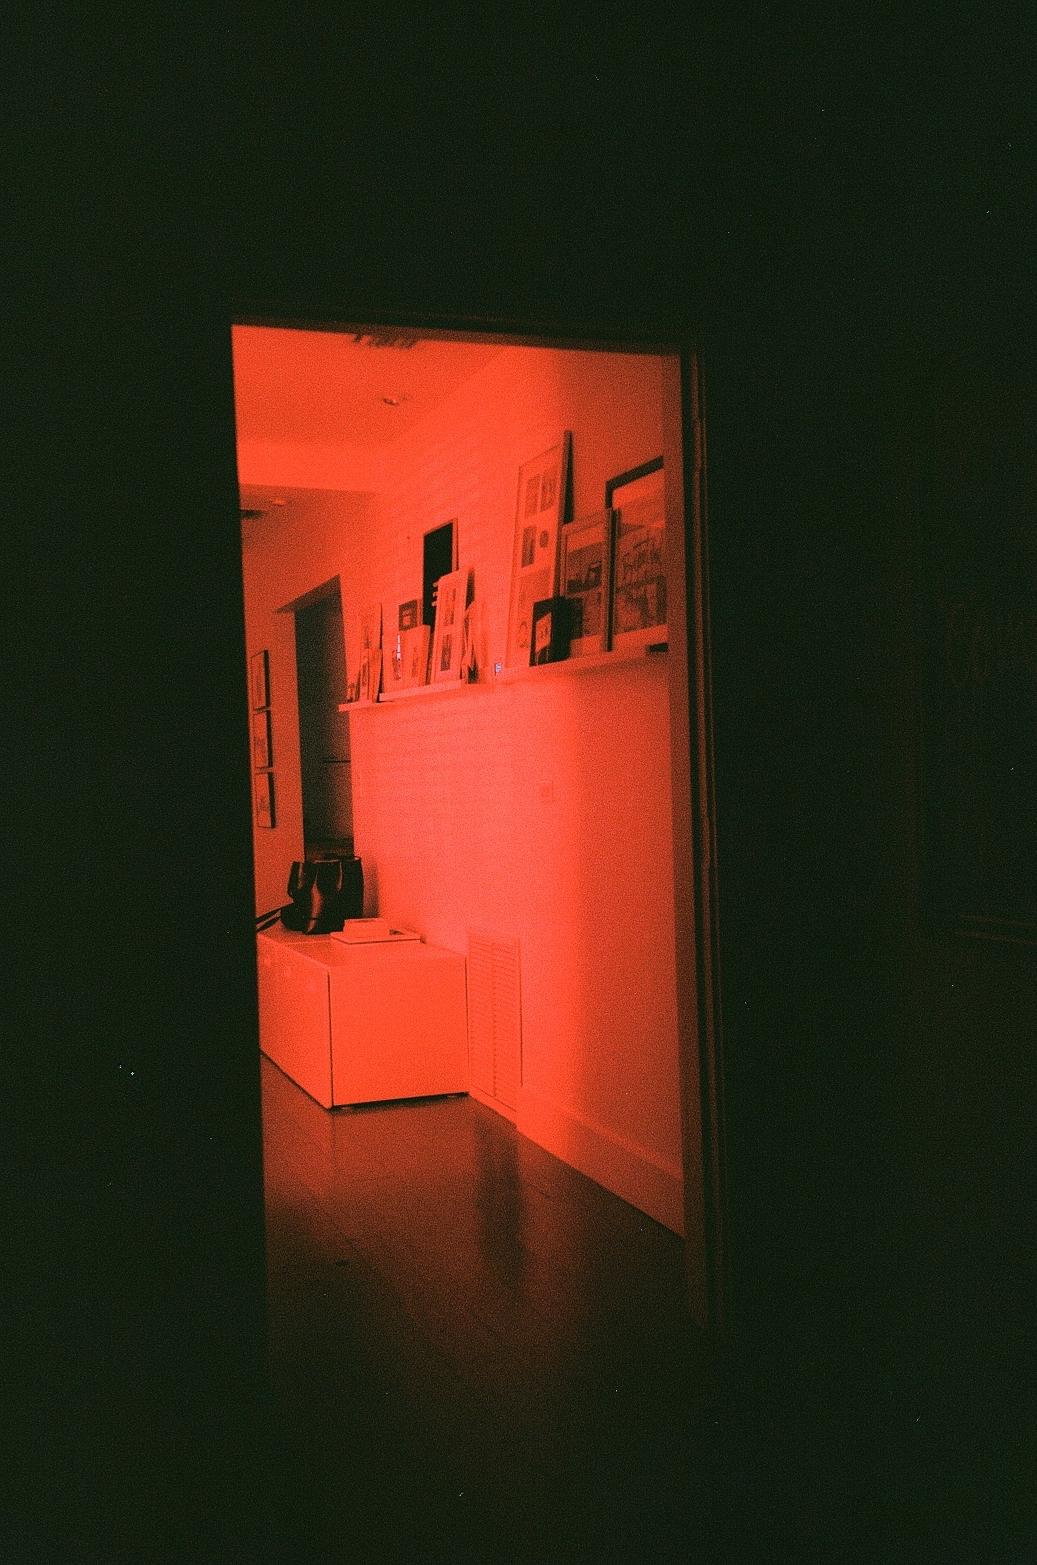 Film photo of Red light shining through doorway in Miami